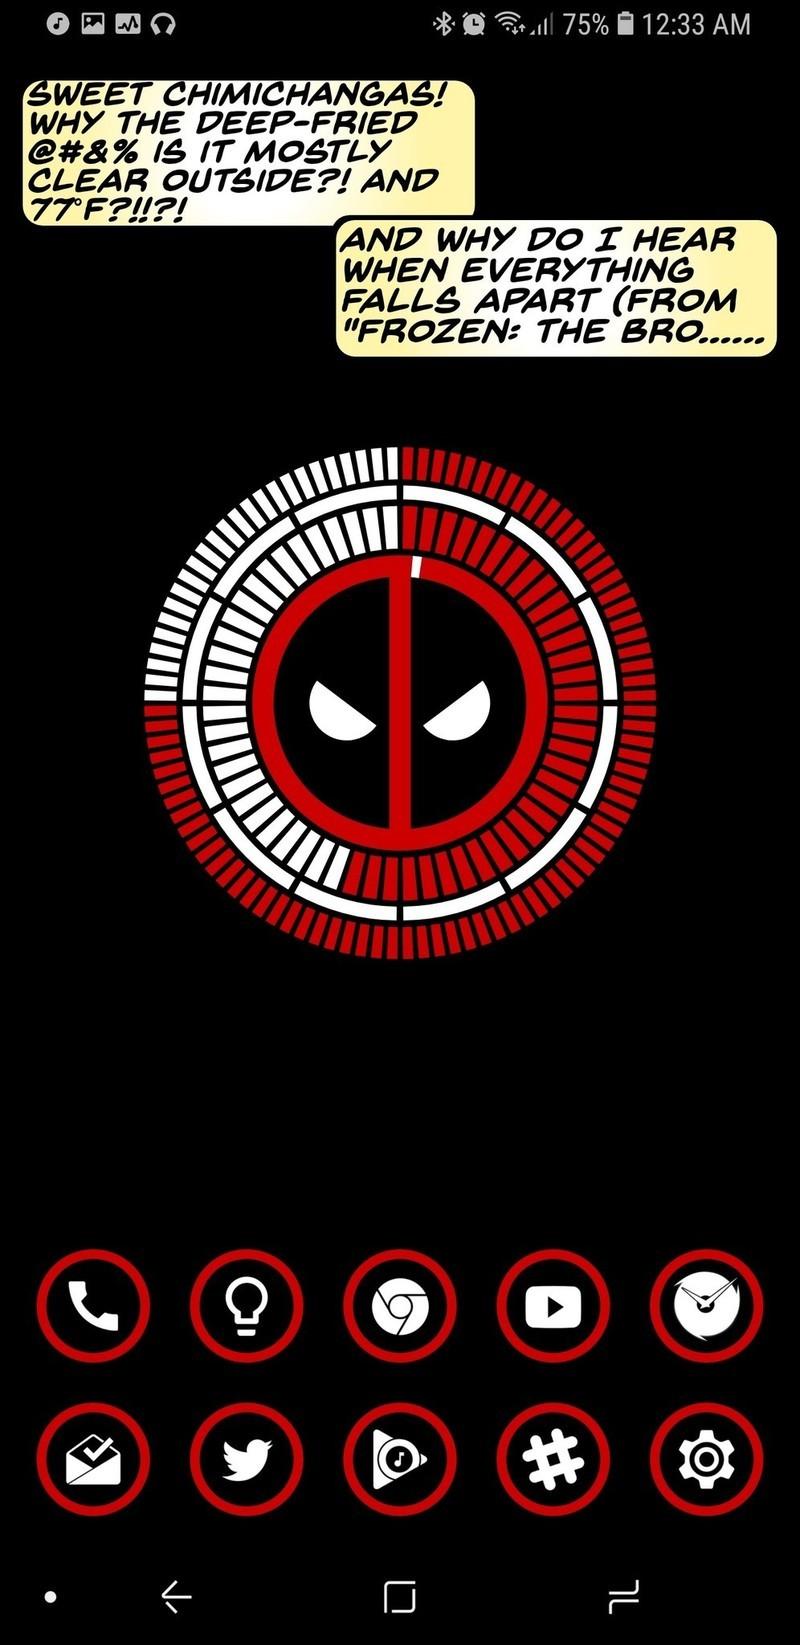 deadpool-18-logo-1.jpg?itok=nRQ6UdG9